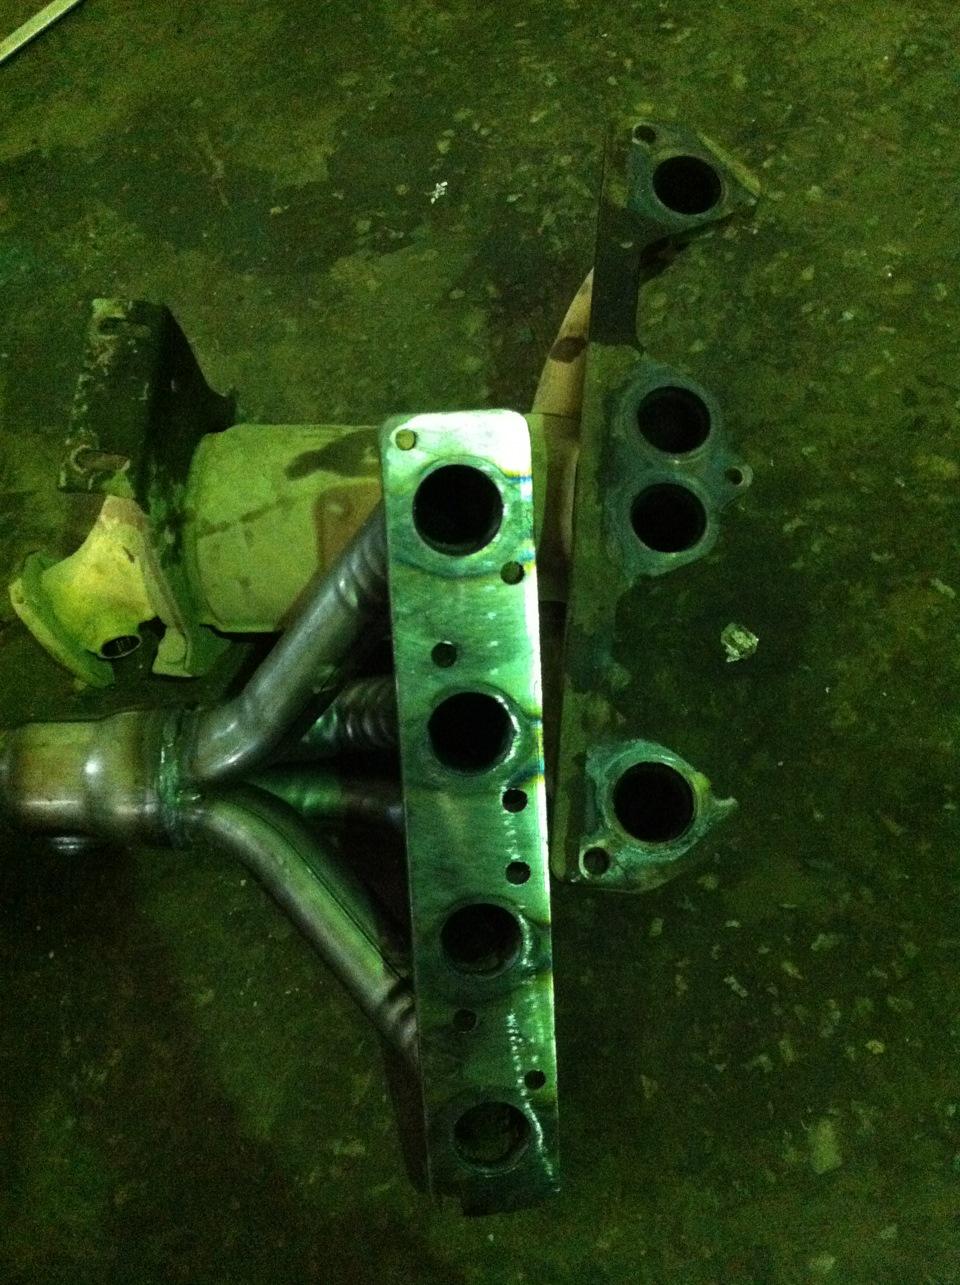 Фото №16 - запах выхлопных газов в салоне ВАЗ 2110